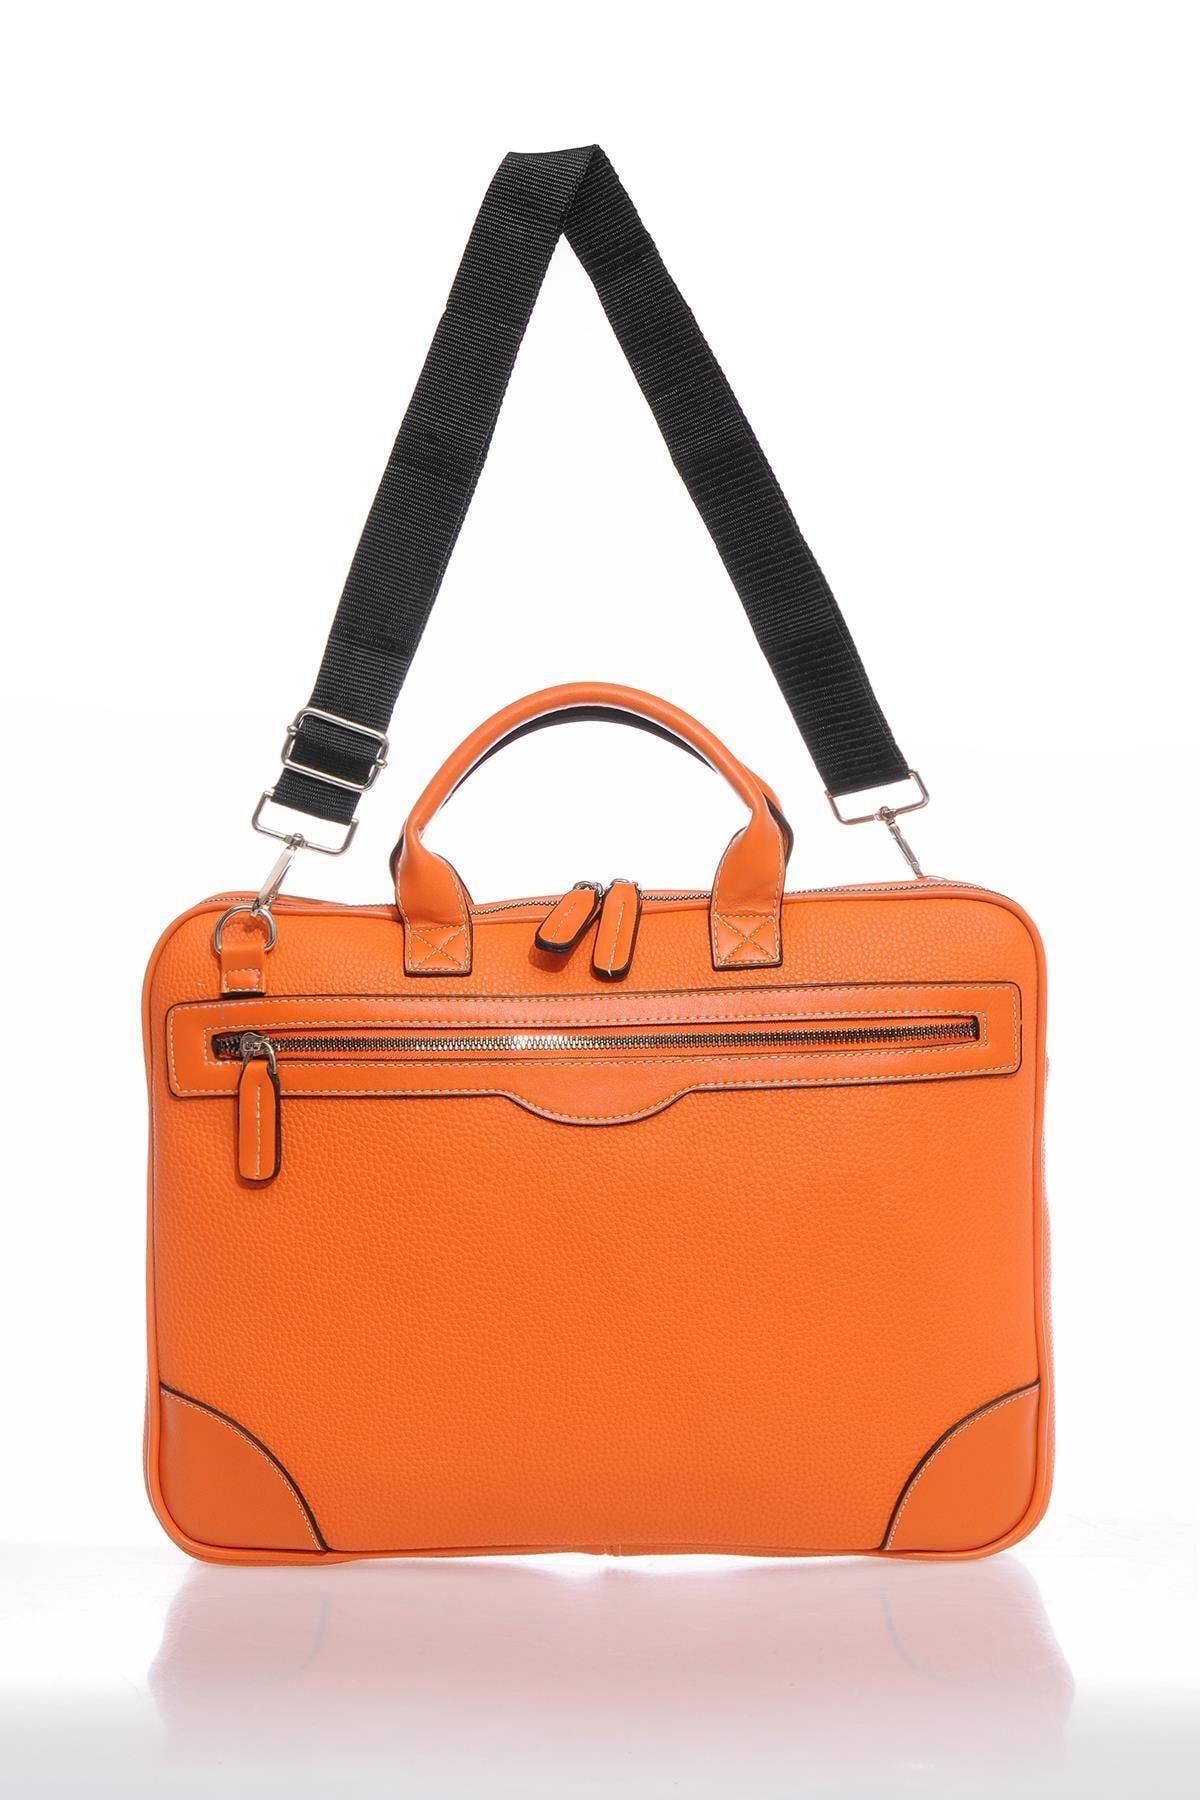 Sergio Giorgianni Mp9124 B.turuncu-turuncu Unısex Evrak Çantası 1